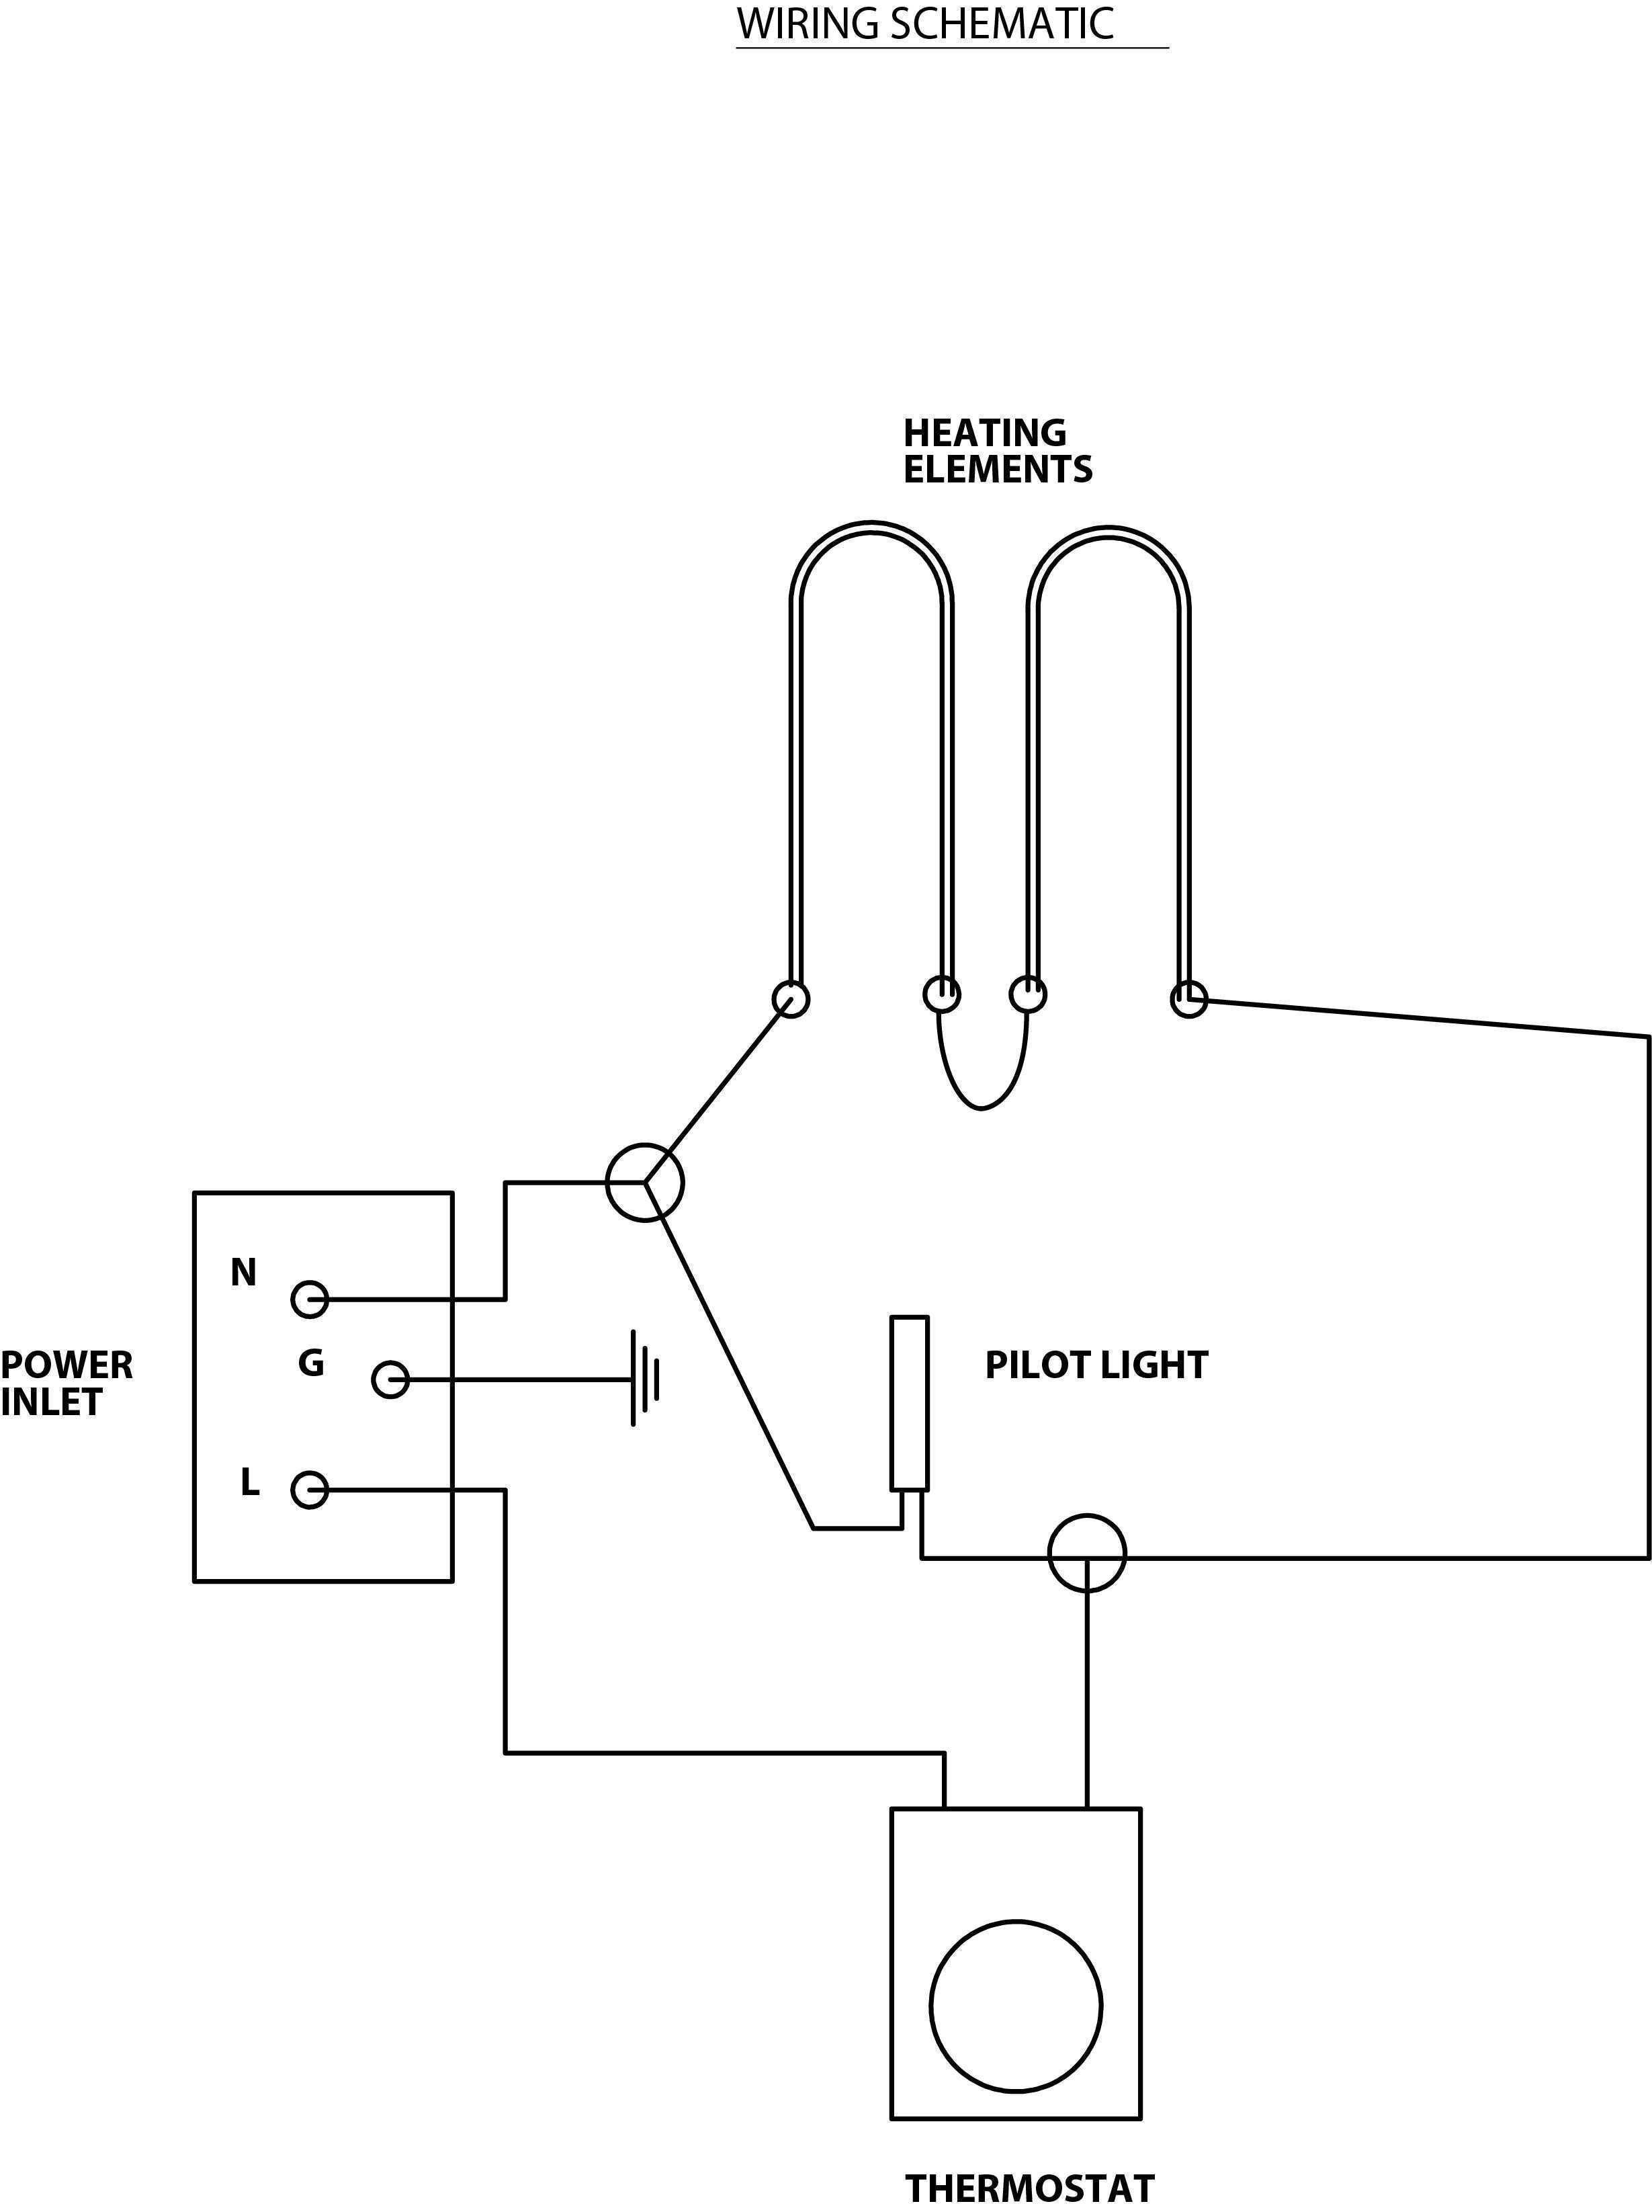 Leeson Electric Motor Wiring Diagram